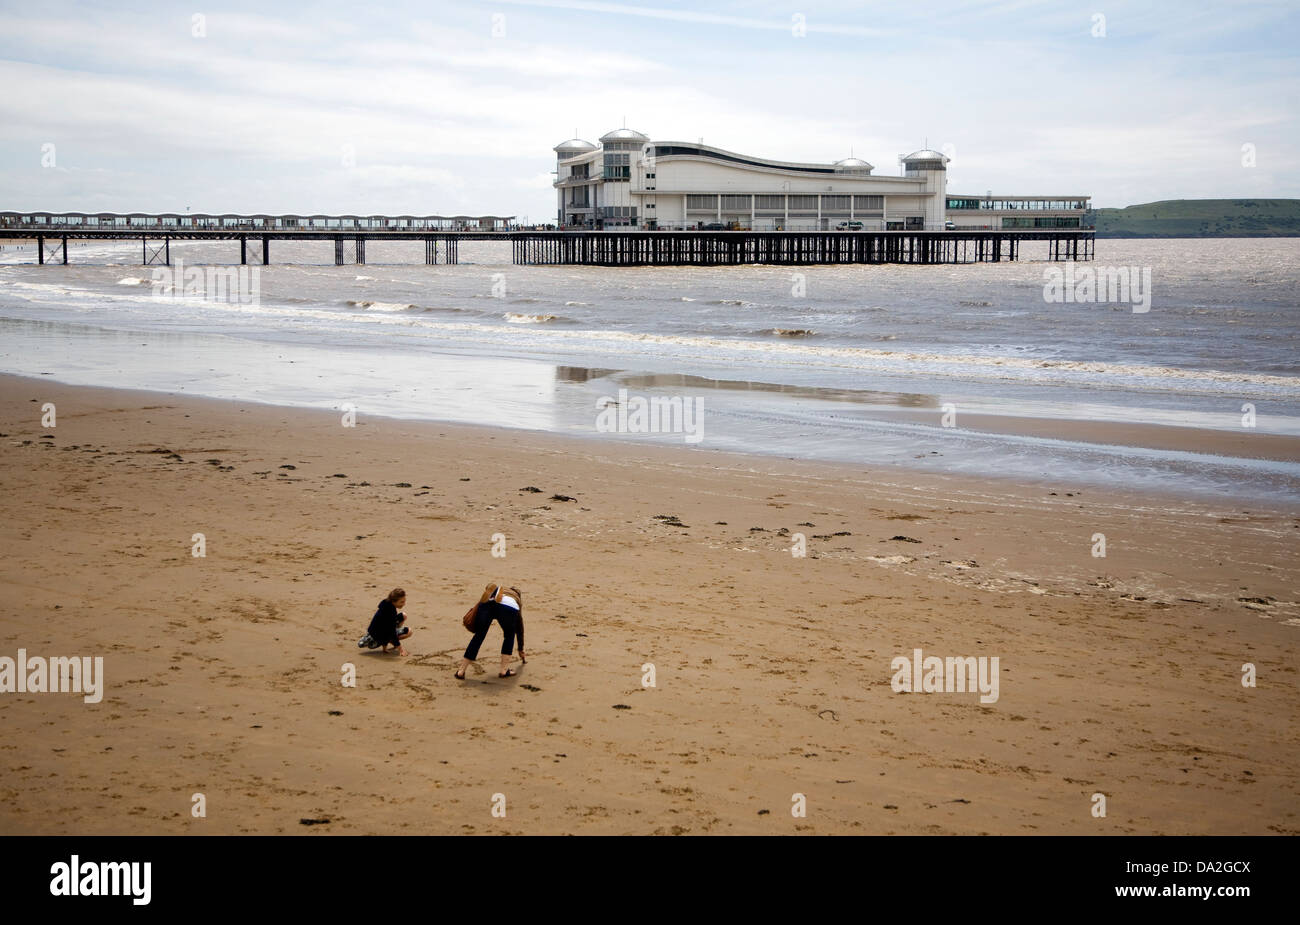 Sandy beach and pier Weston Super Mare, Somerset, England - Stock Image